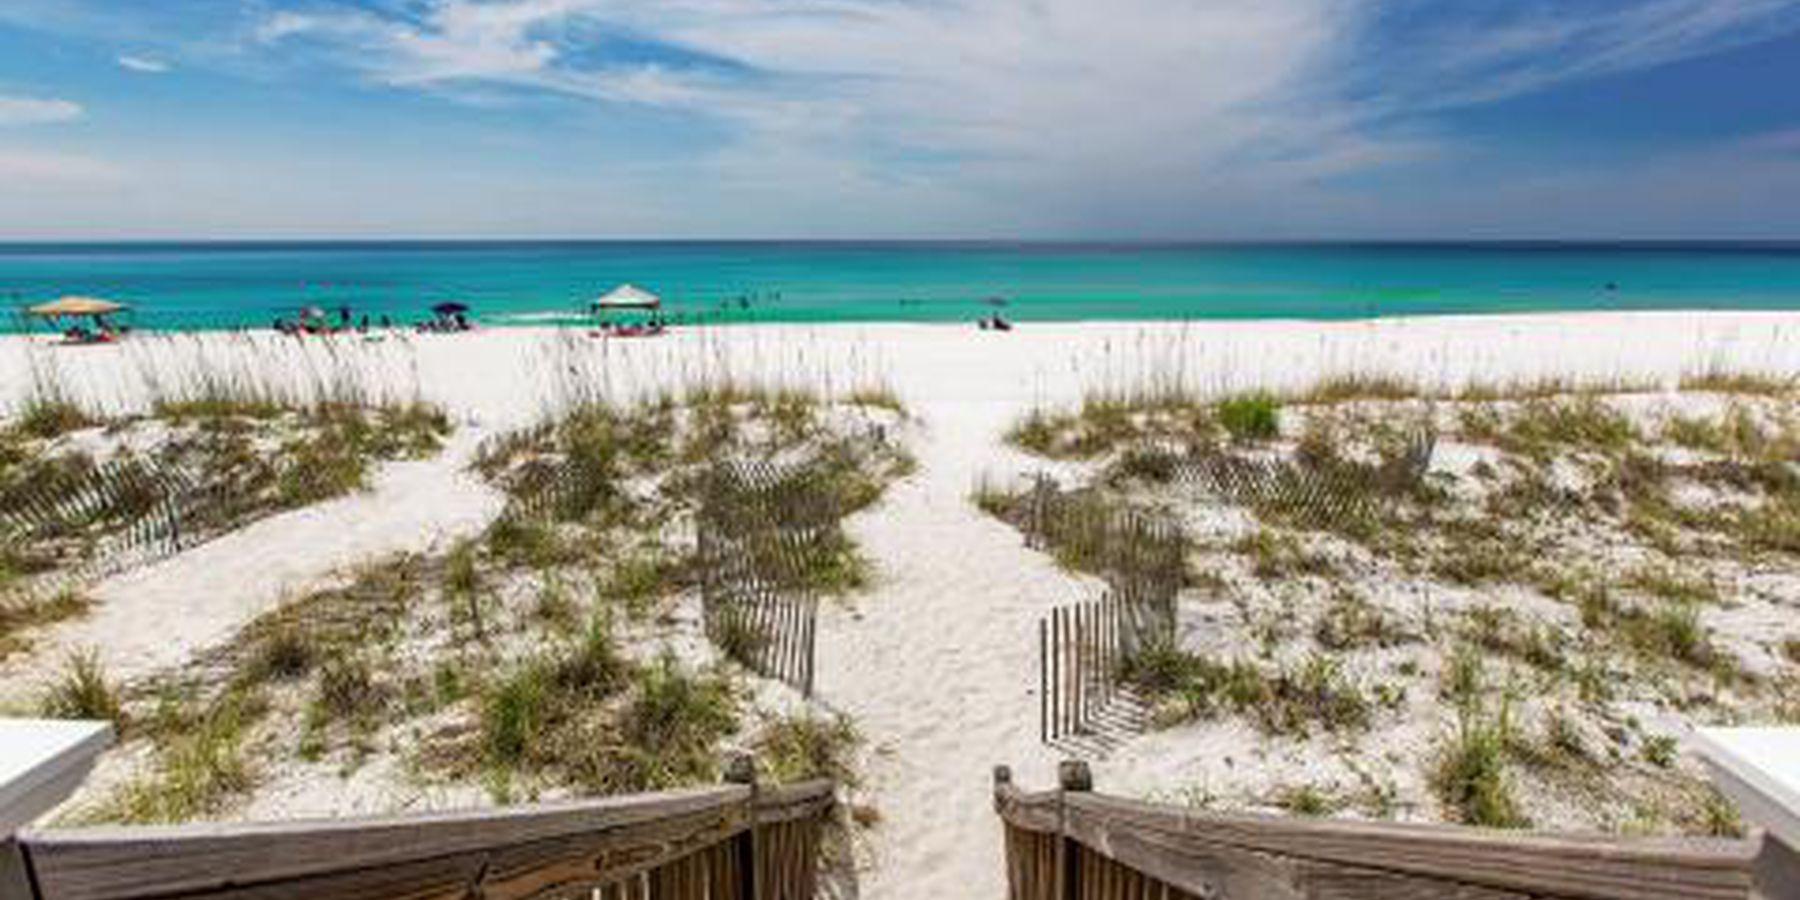 Destin - Fort Walton Beach - Florida - Doets Reizen